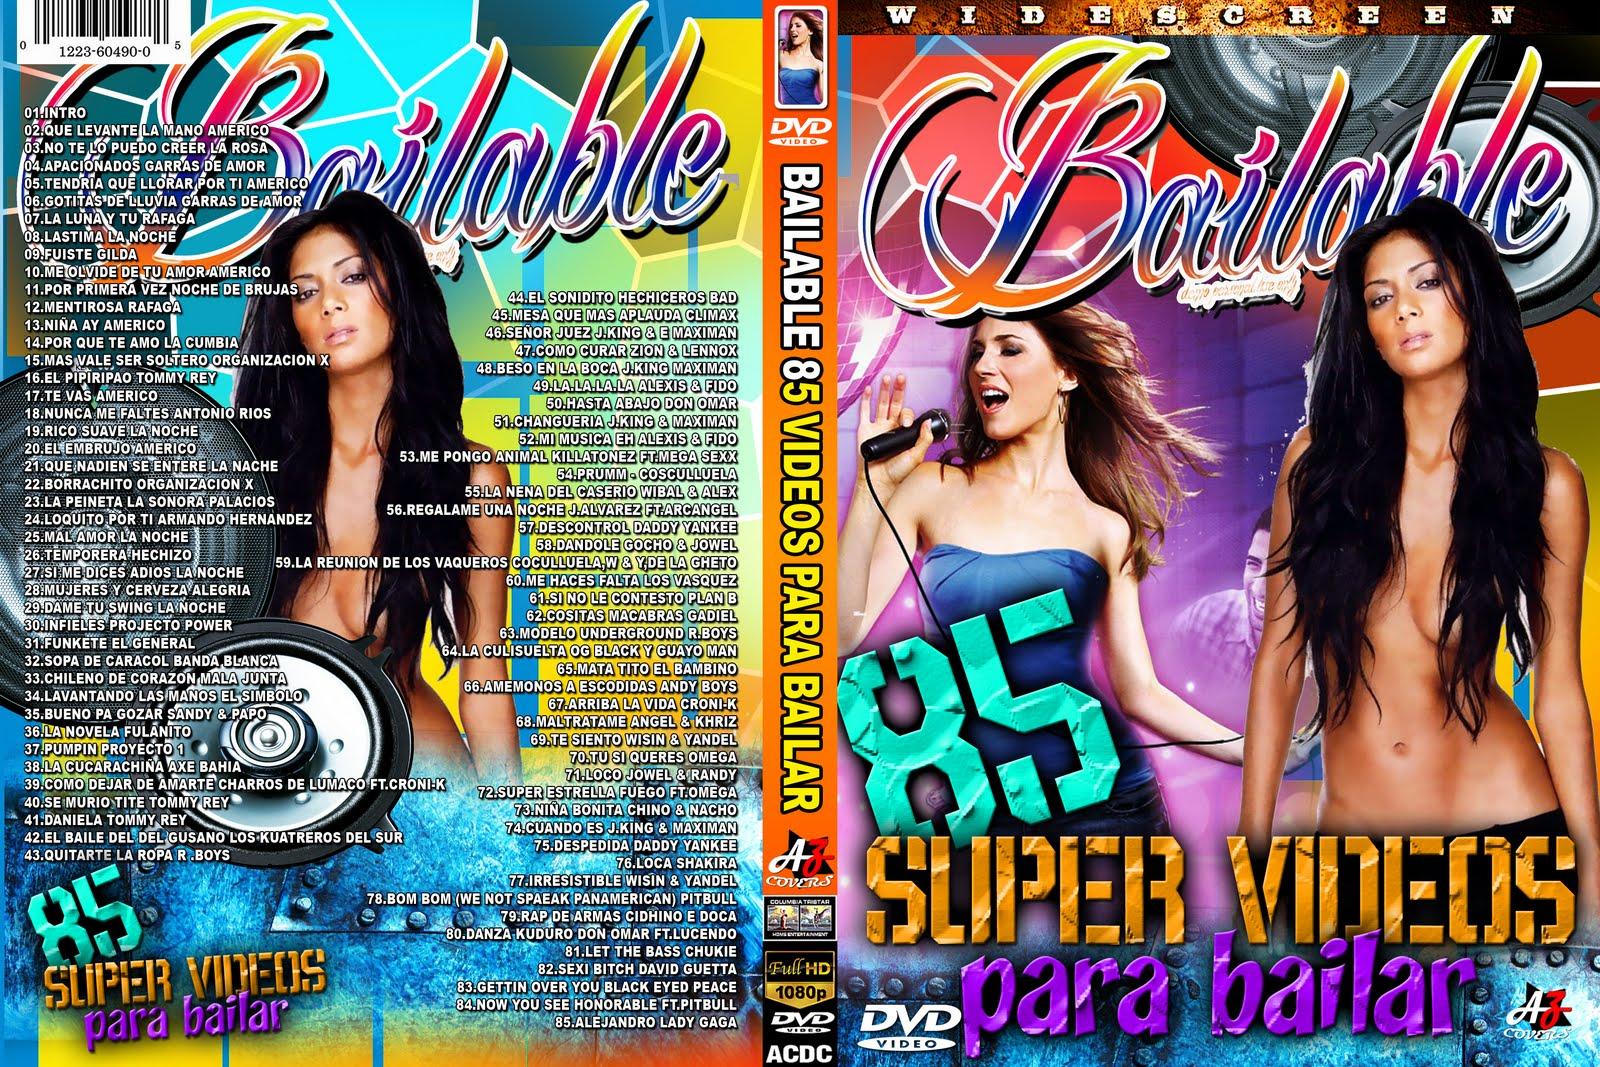 http://1.bp.blogspot.com/-zEhm-T5Jnfs/TdxO96dQhhI/AAAAAAAAATg/JjAxUMapo6k/s1600/bailable+85+videos+para+bailar.jpg